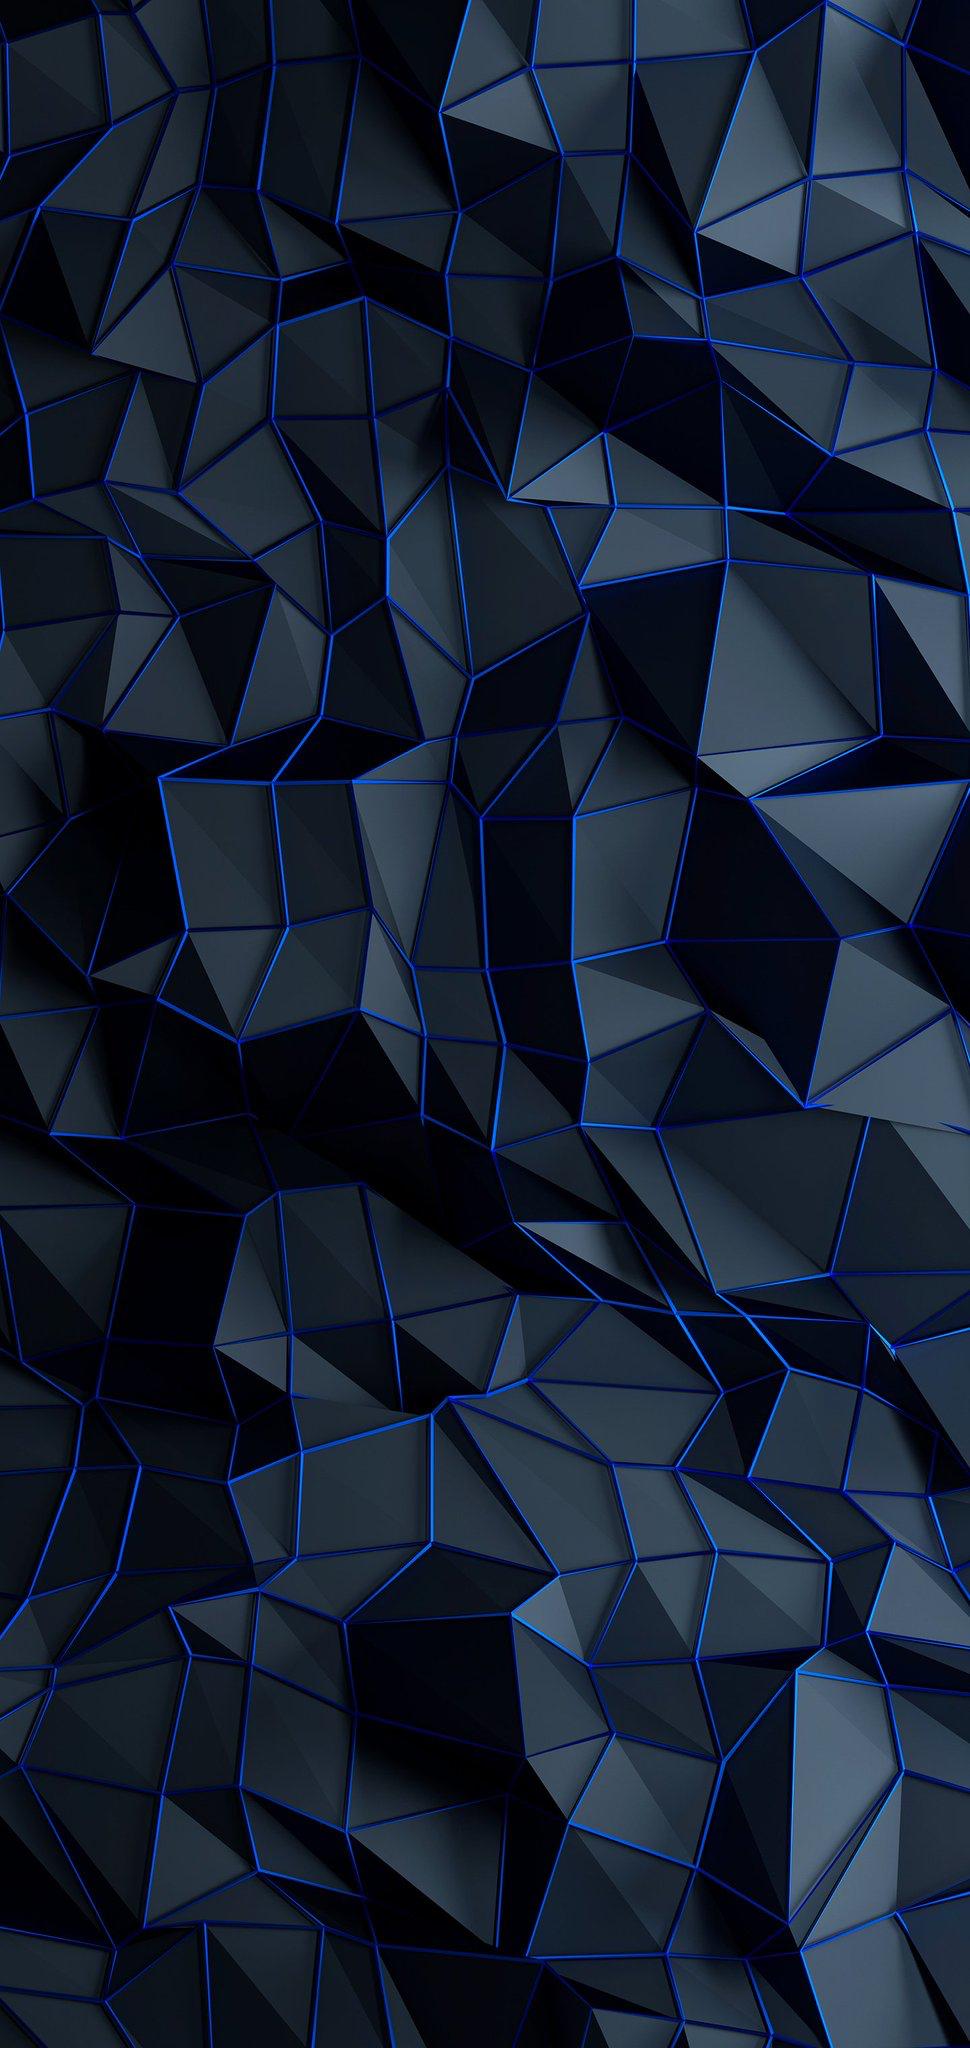 Abstract geometric iPhone wallpaper ieditwalls iDownloadBlog 2